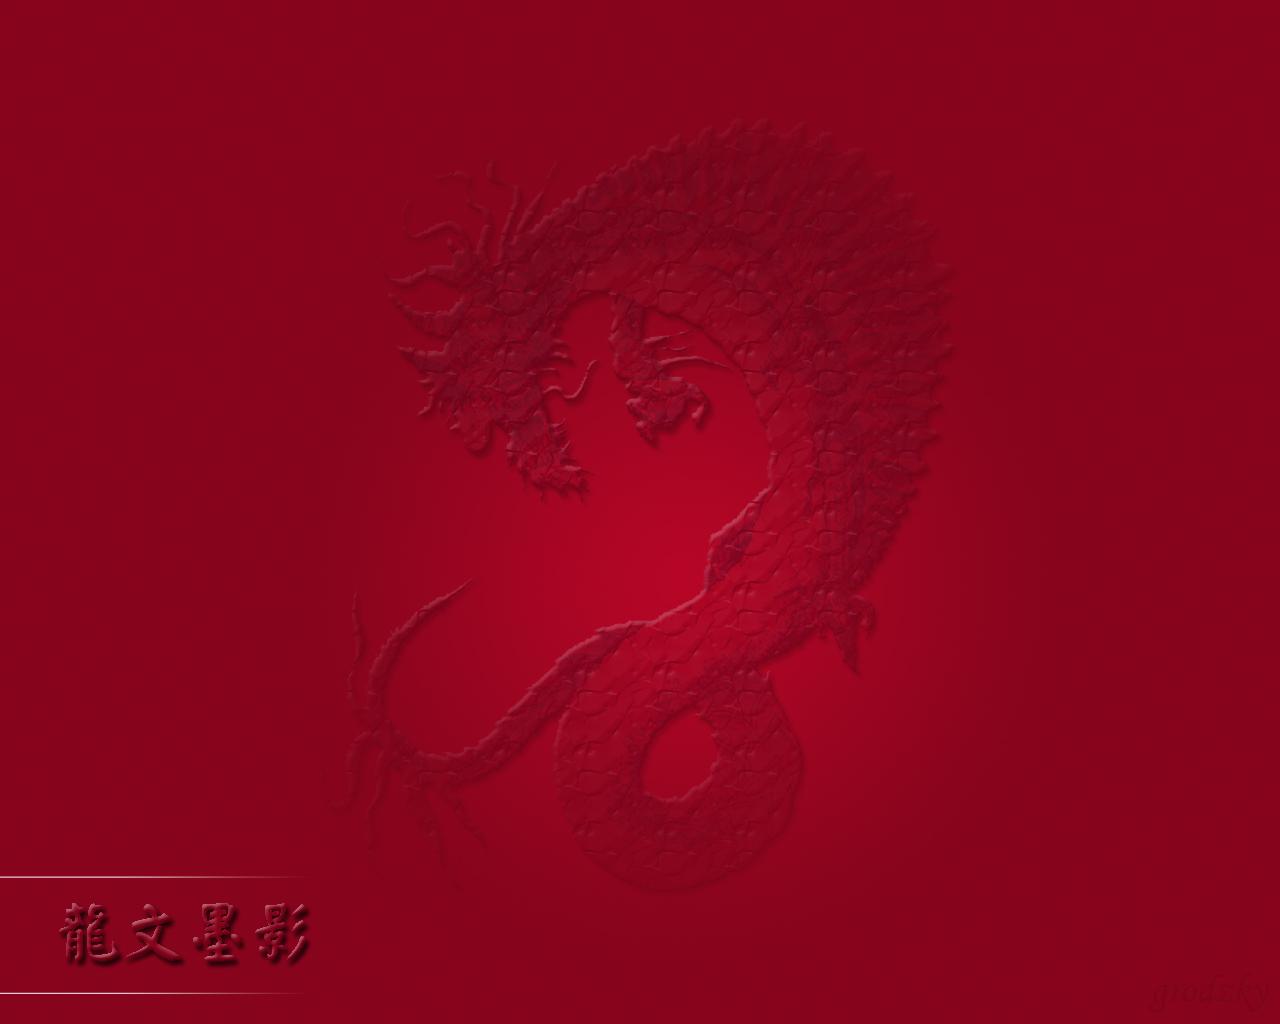 [42+] Red Oriental Wallpaper on WallpaperSafari